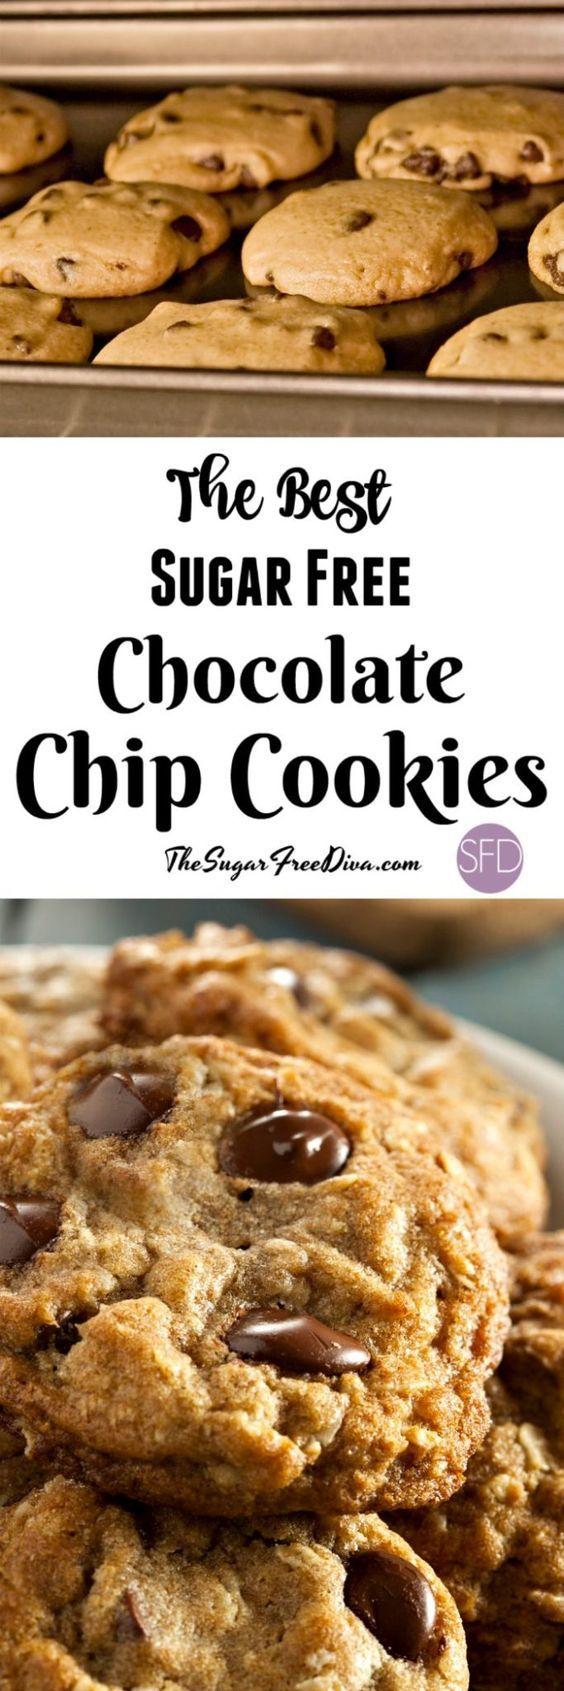 The Best Sugar Free Chocolate Chip Cookies via @thesugarfreediva